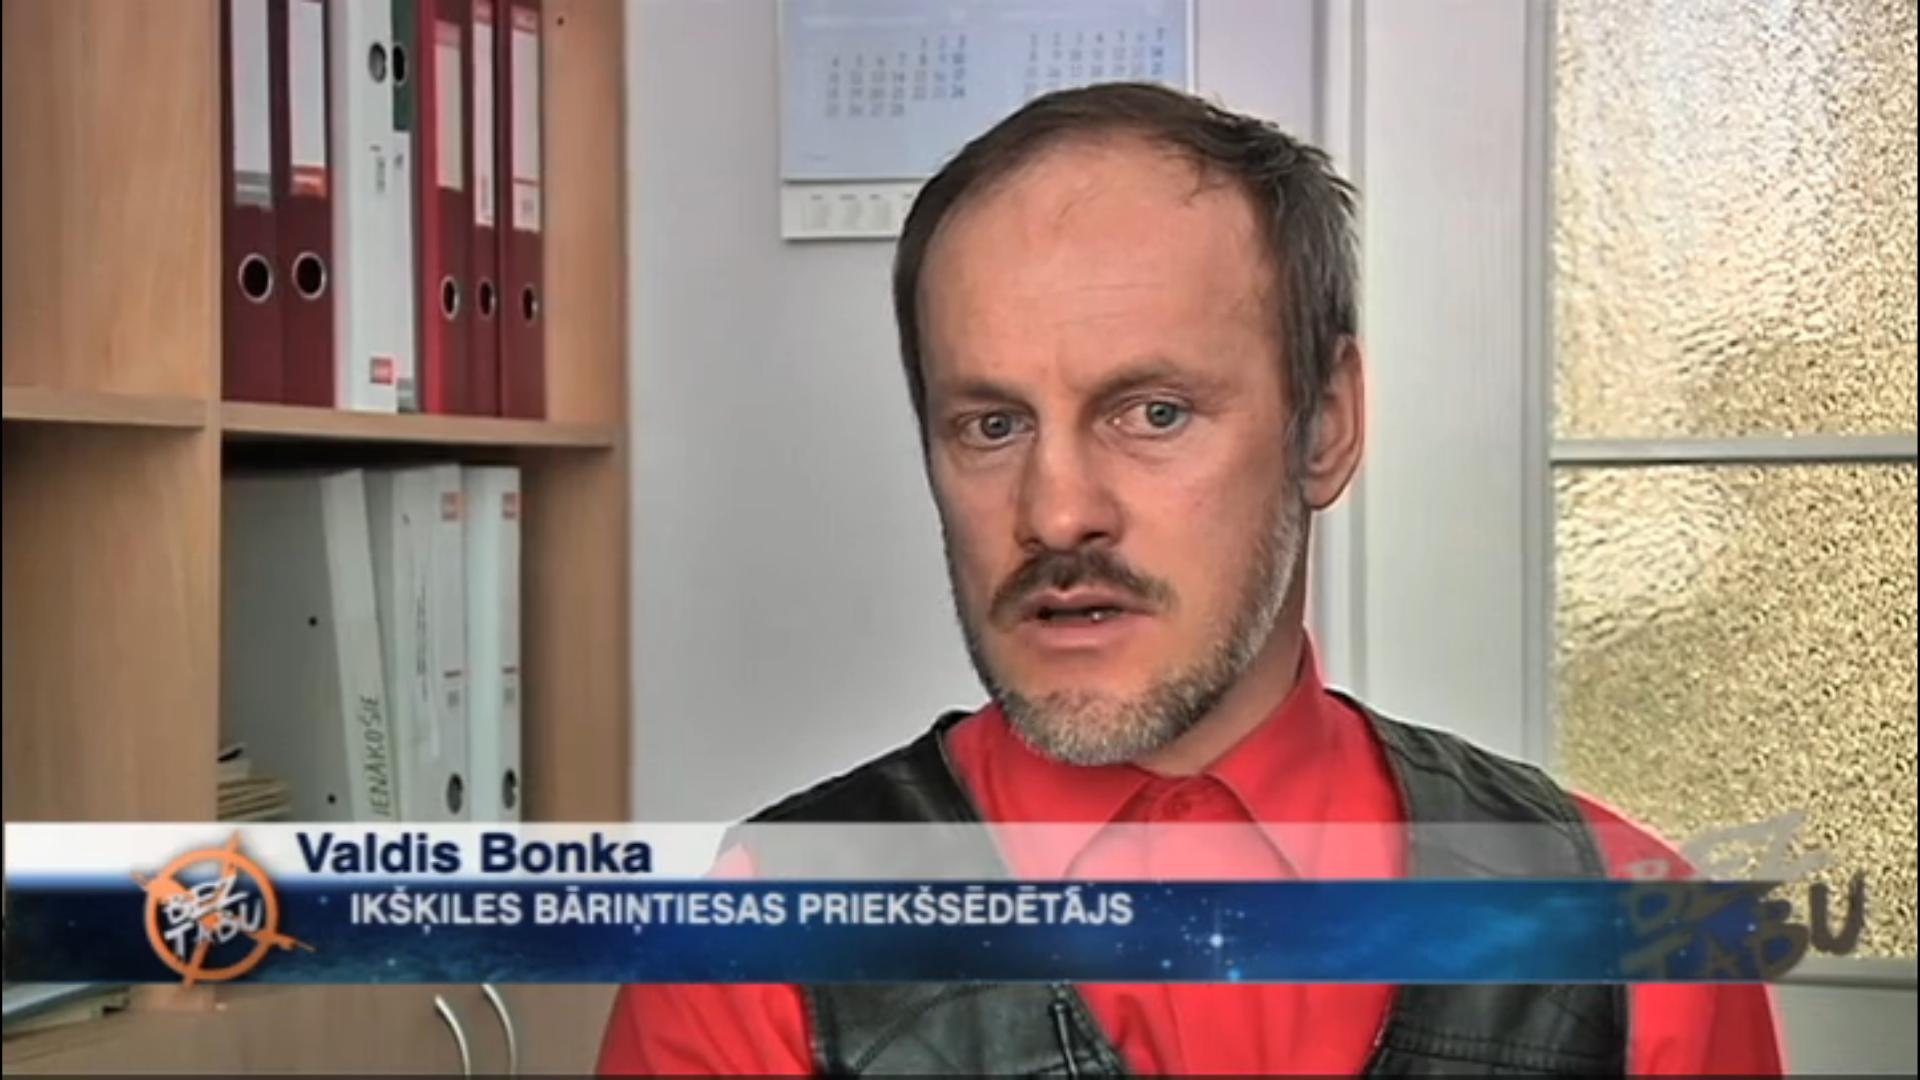 valdis-bonka